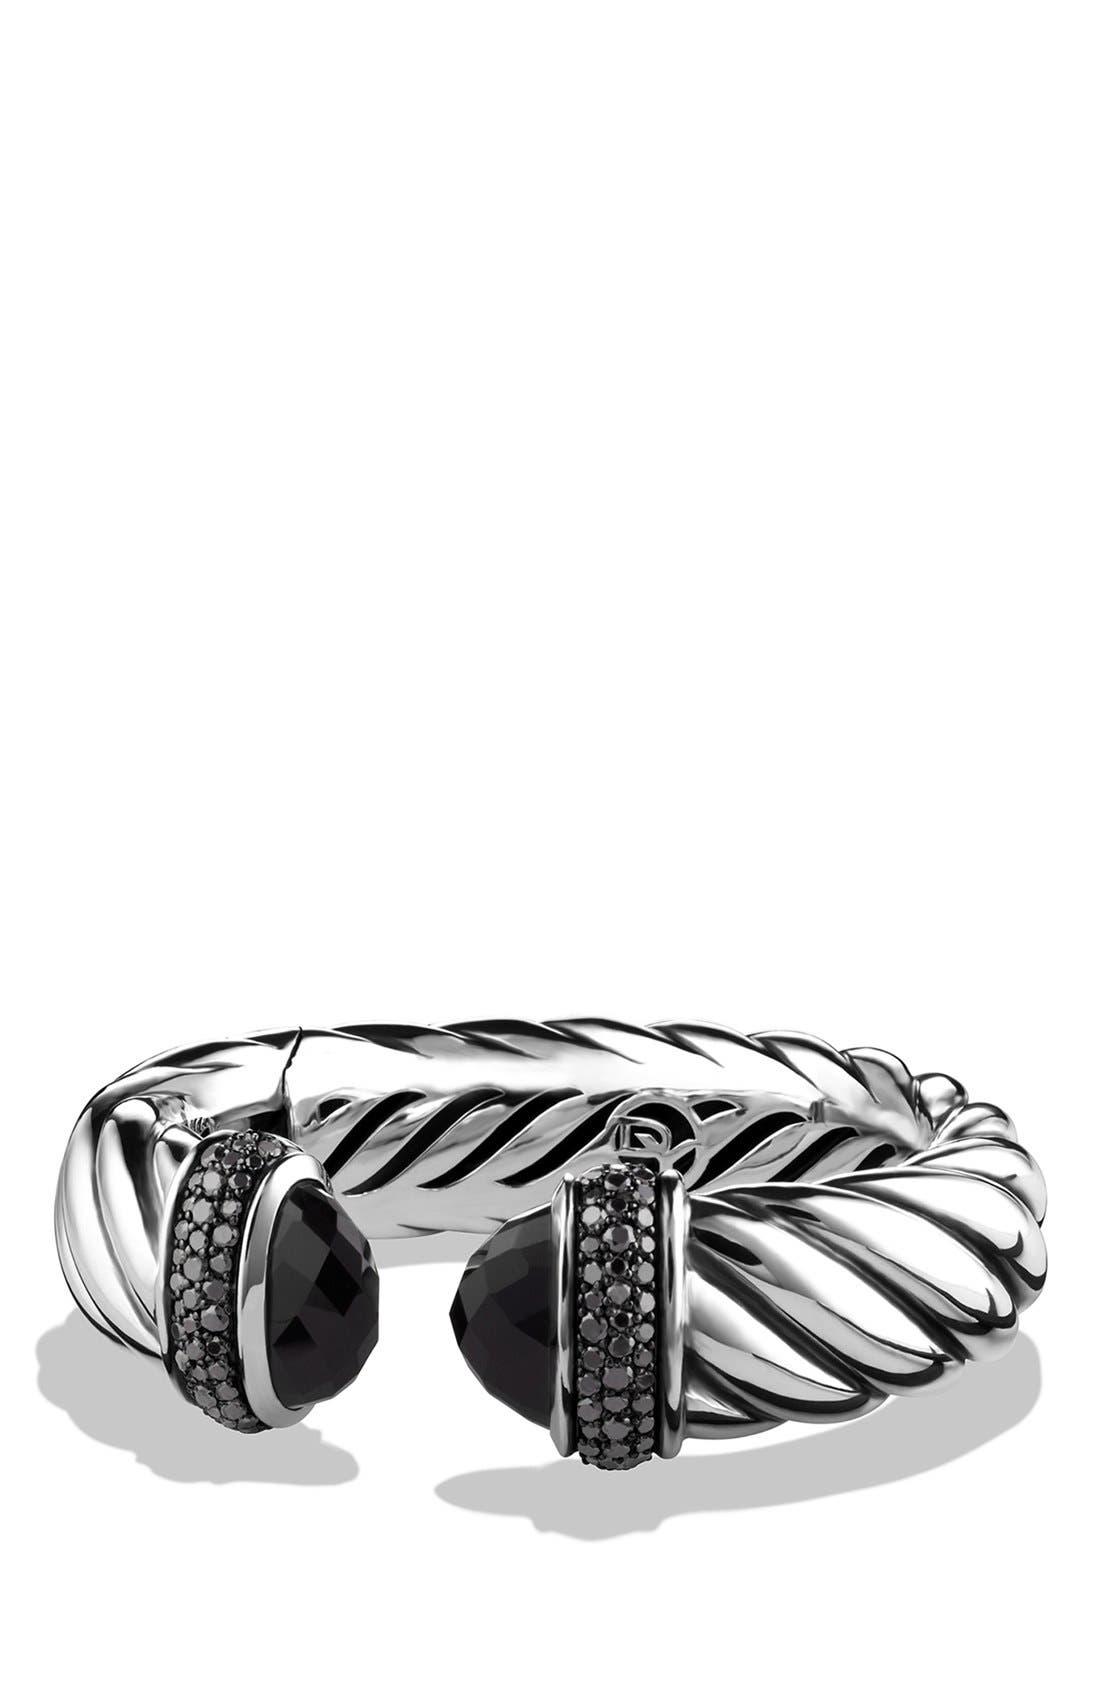 Main Image - David Yurman 'Waverly' Bracelet with Semiprecious Stones & Gems